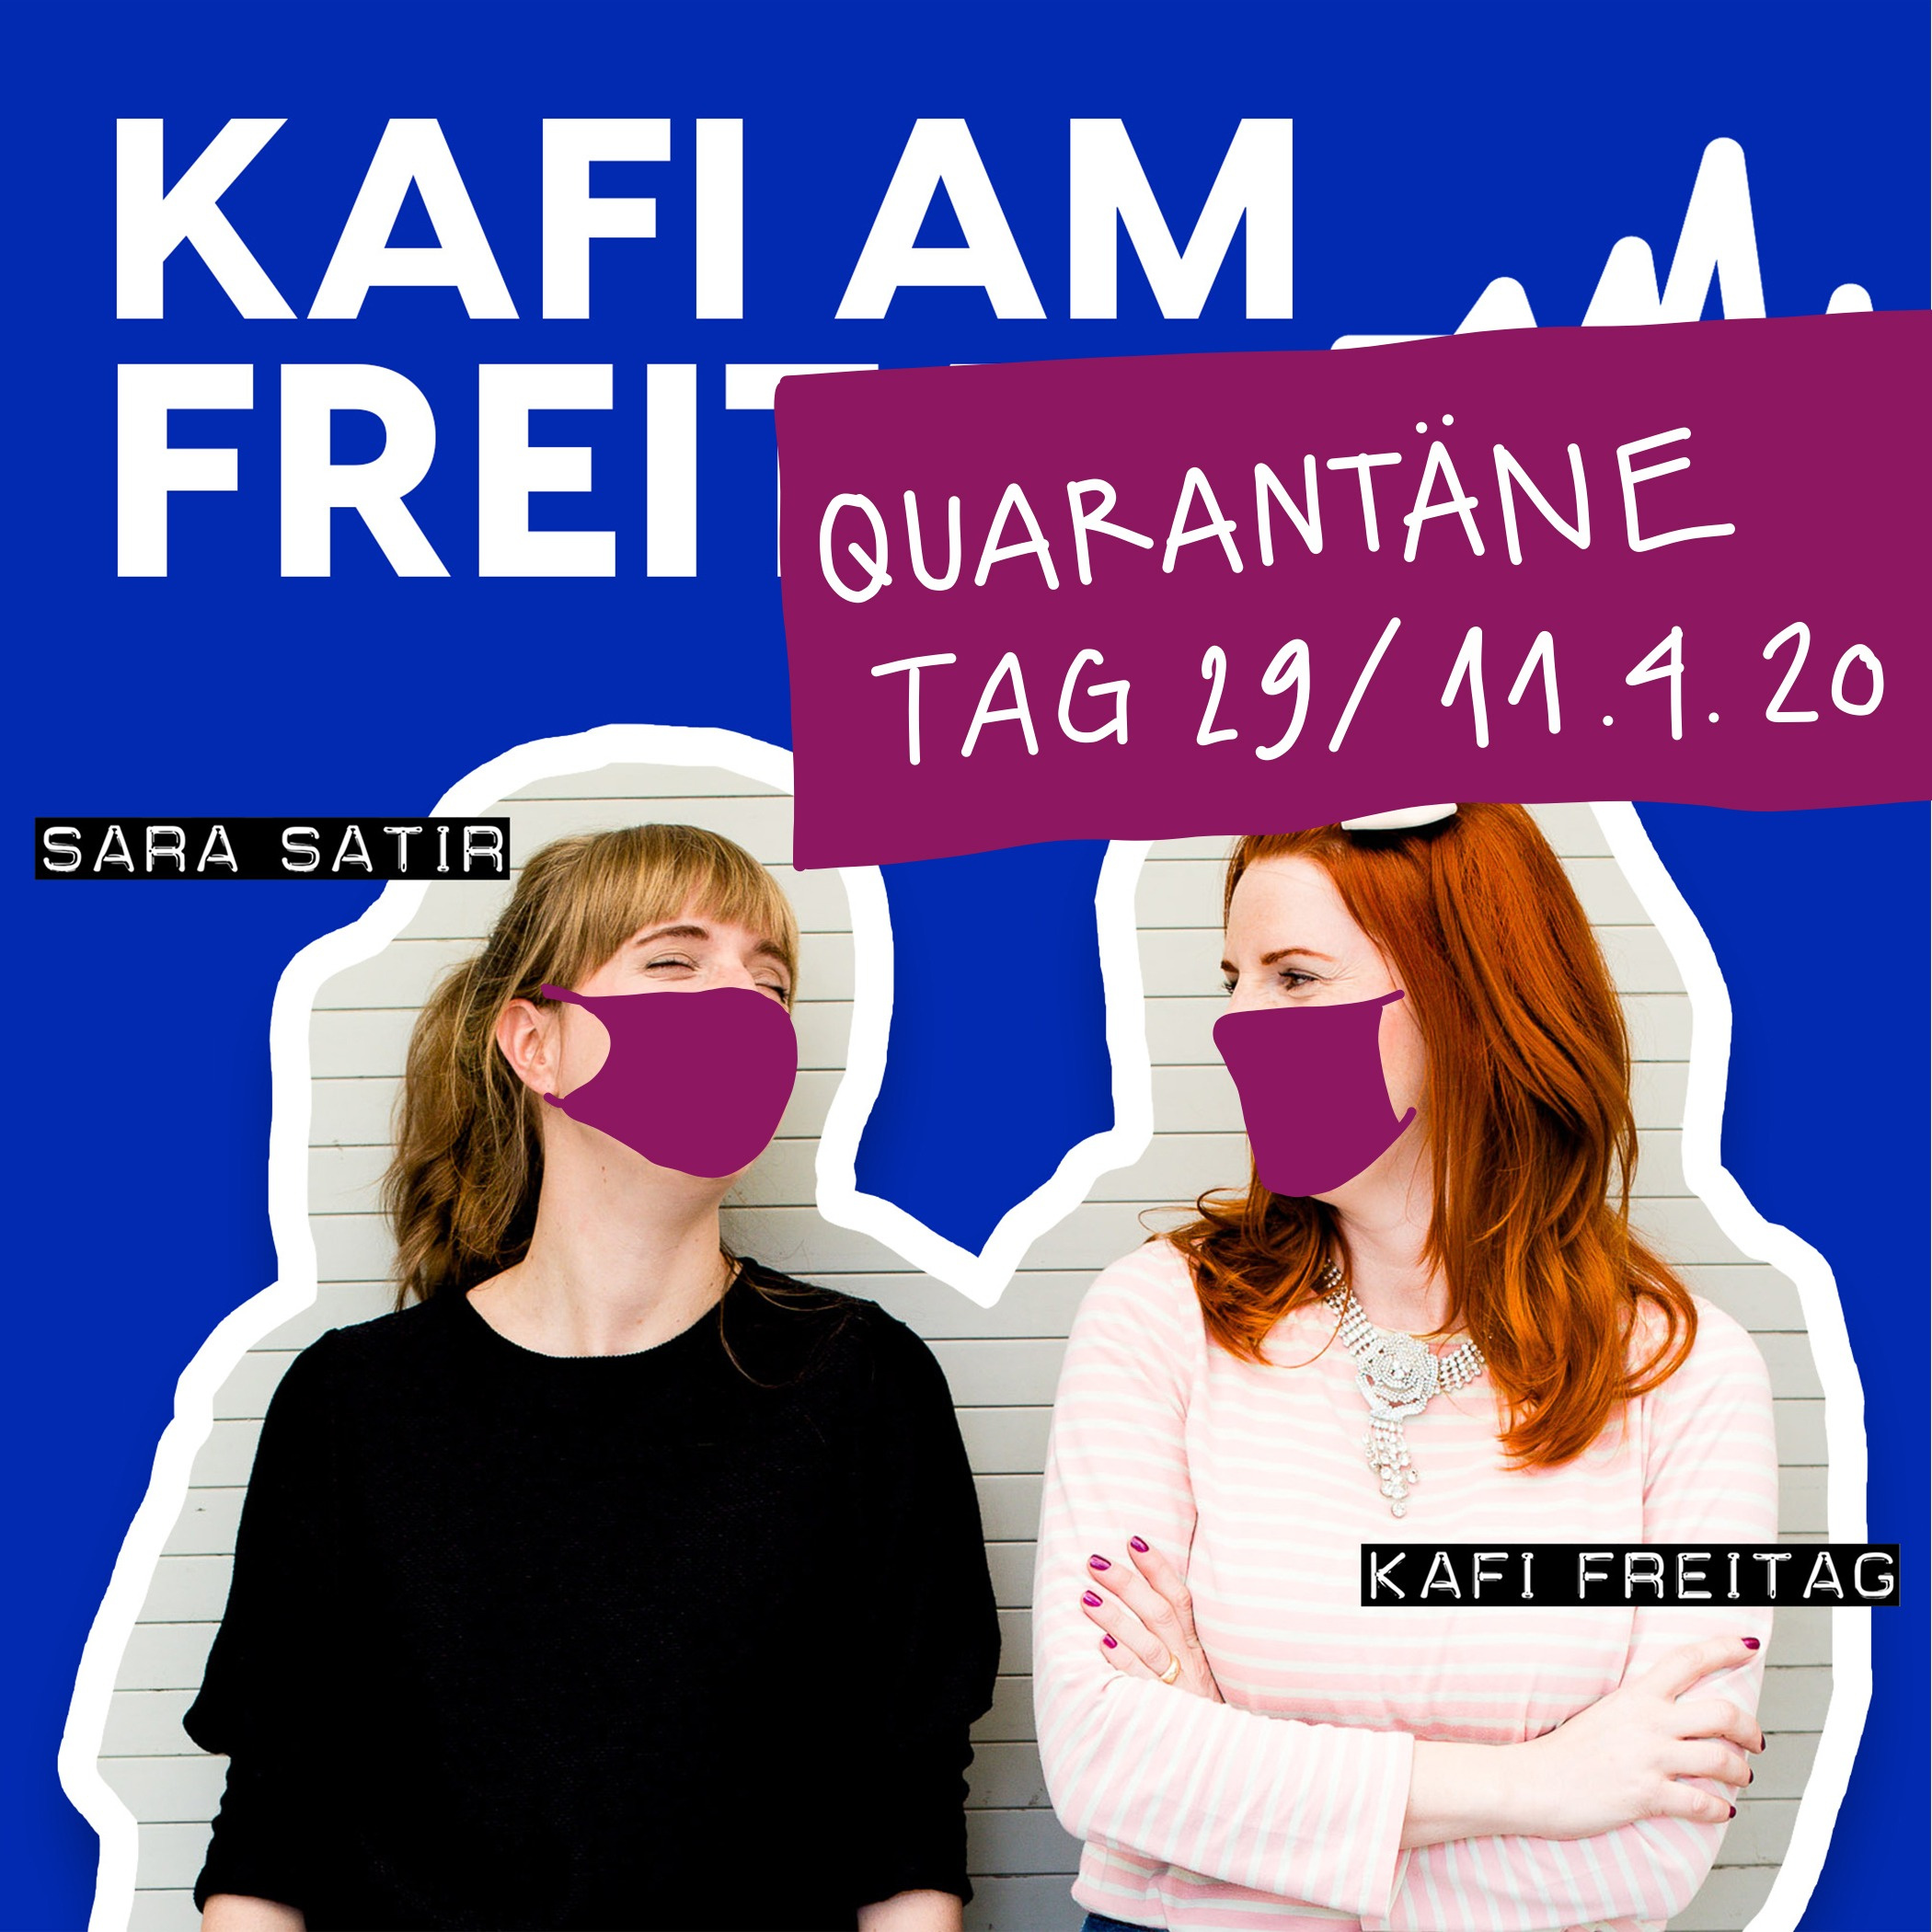 Quarantäne Tag 29 - 11.4.20